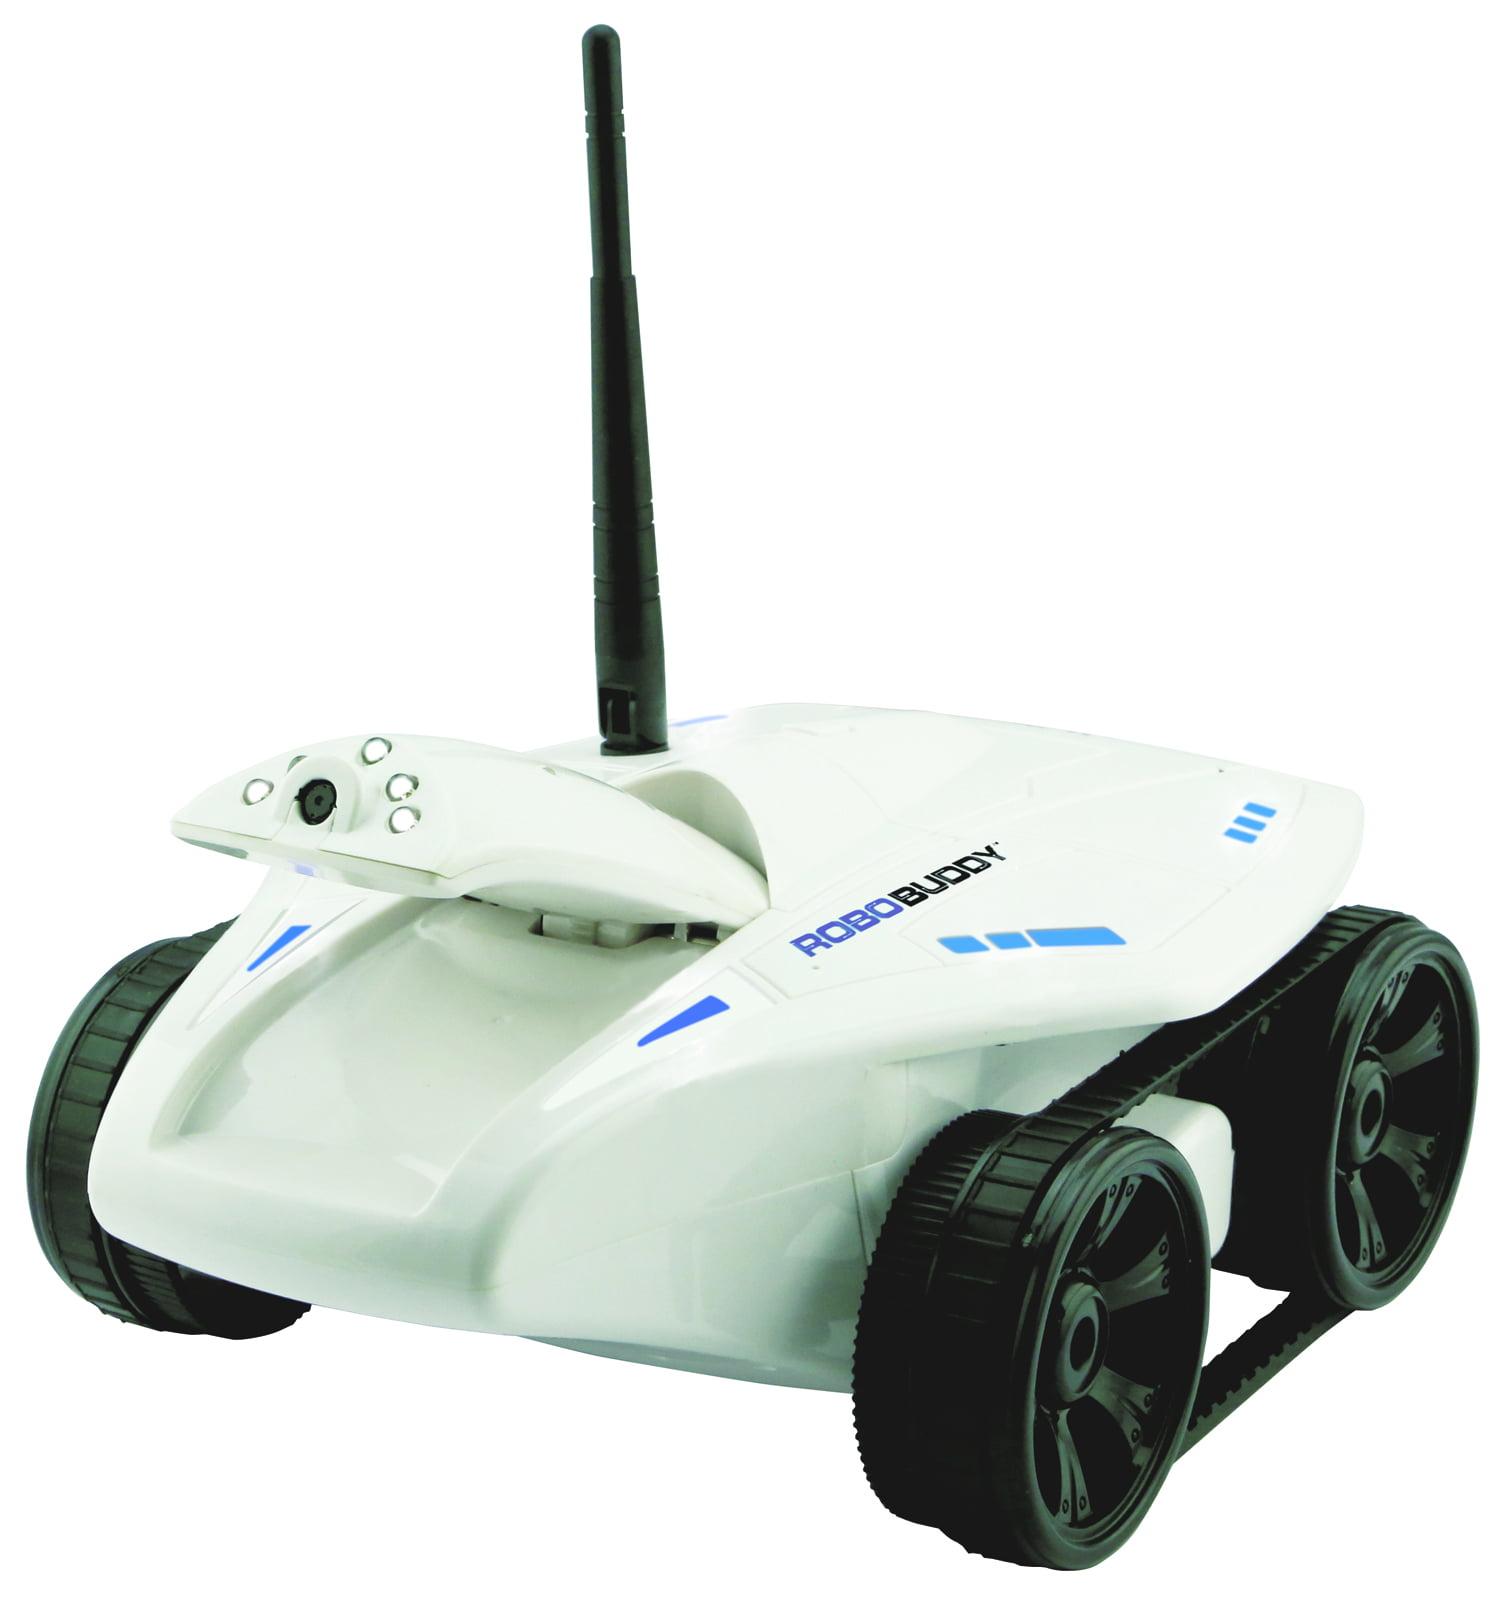 Wireless HD Wi-Fi Security Camera Robo Buddy Mobile Vehicle